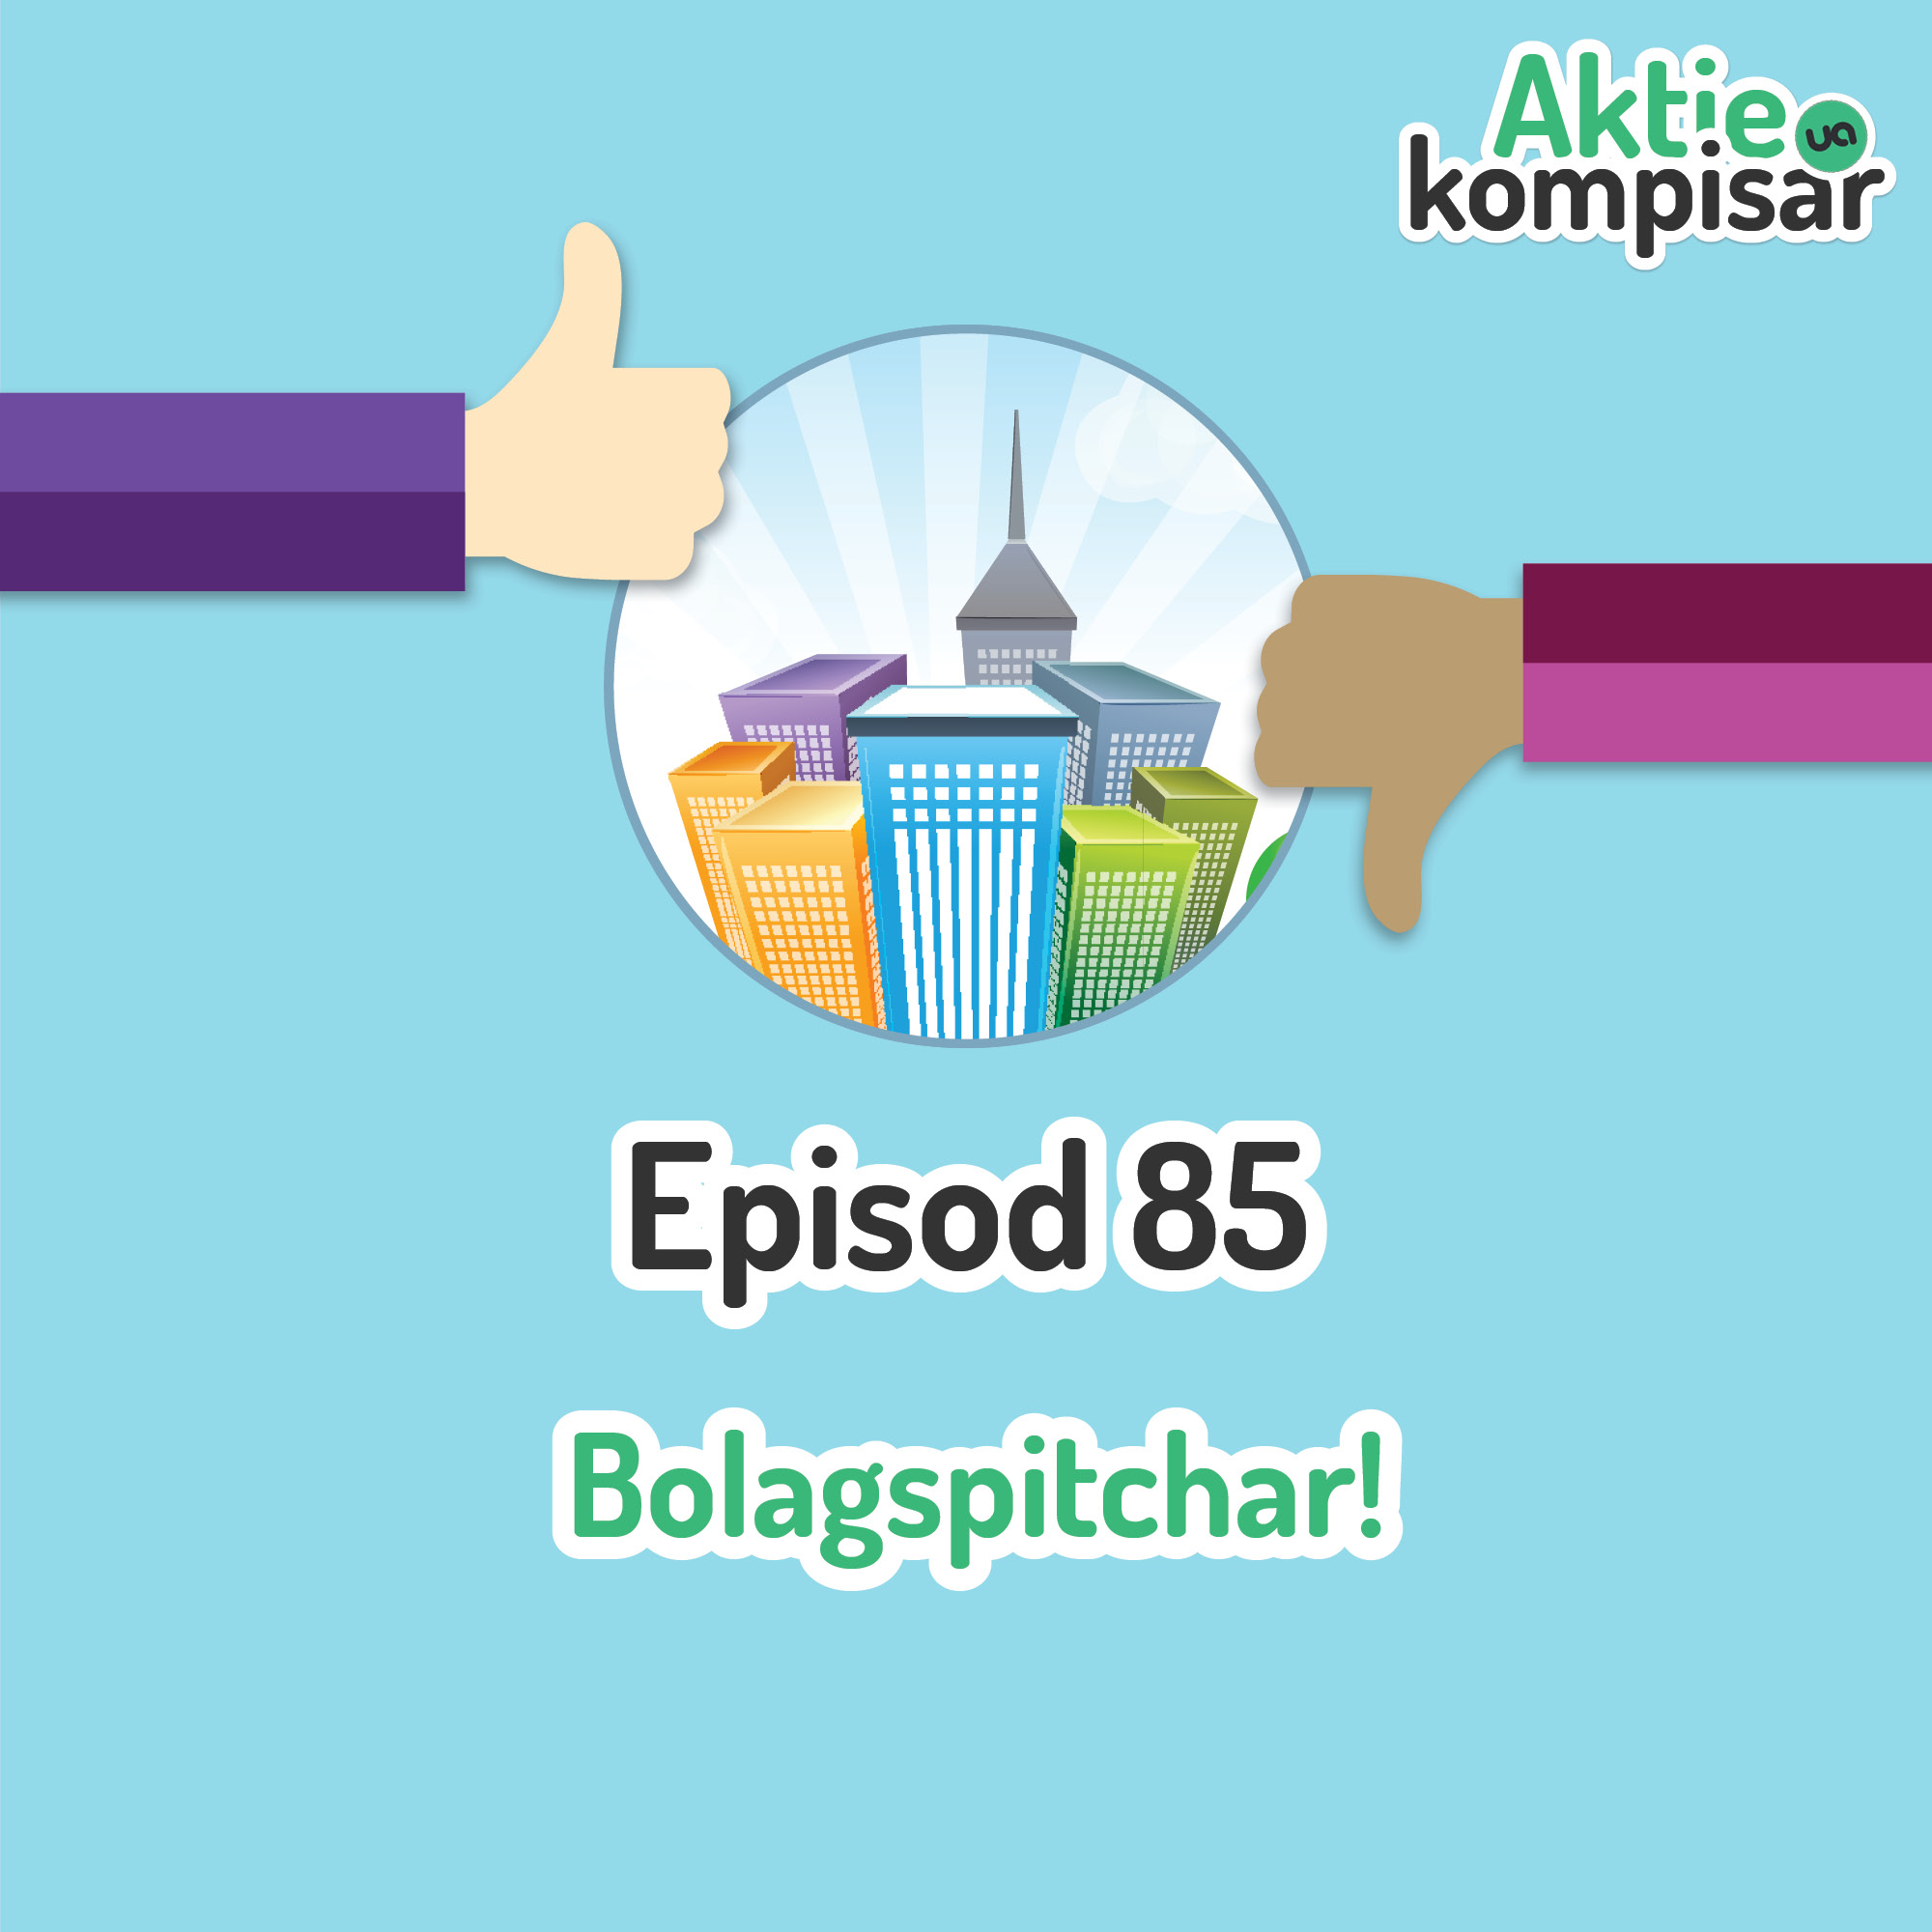 Episod 85 - Bolagspitchar!